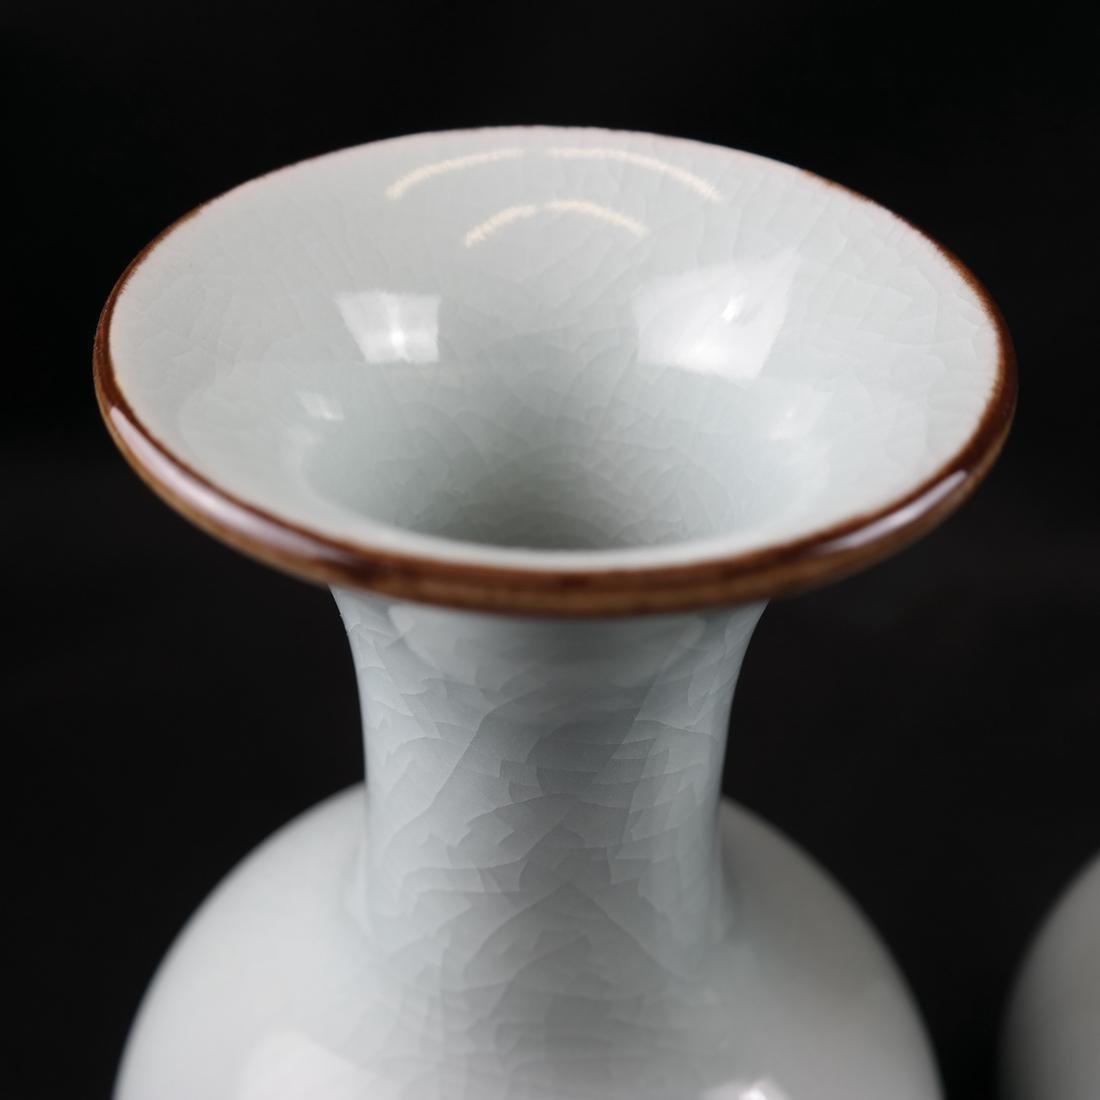 Pair of Celadon-Style Vases - 2